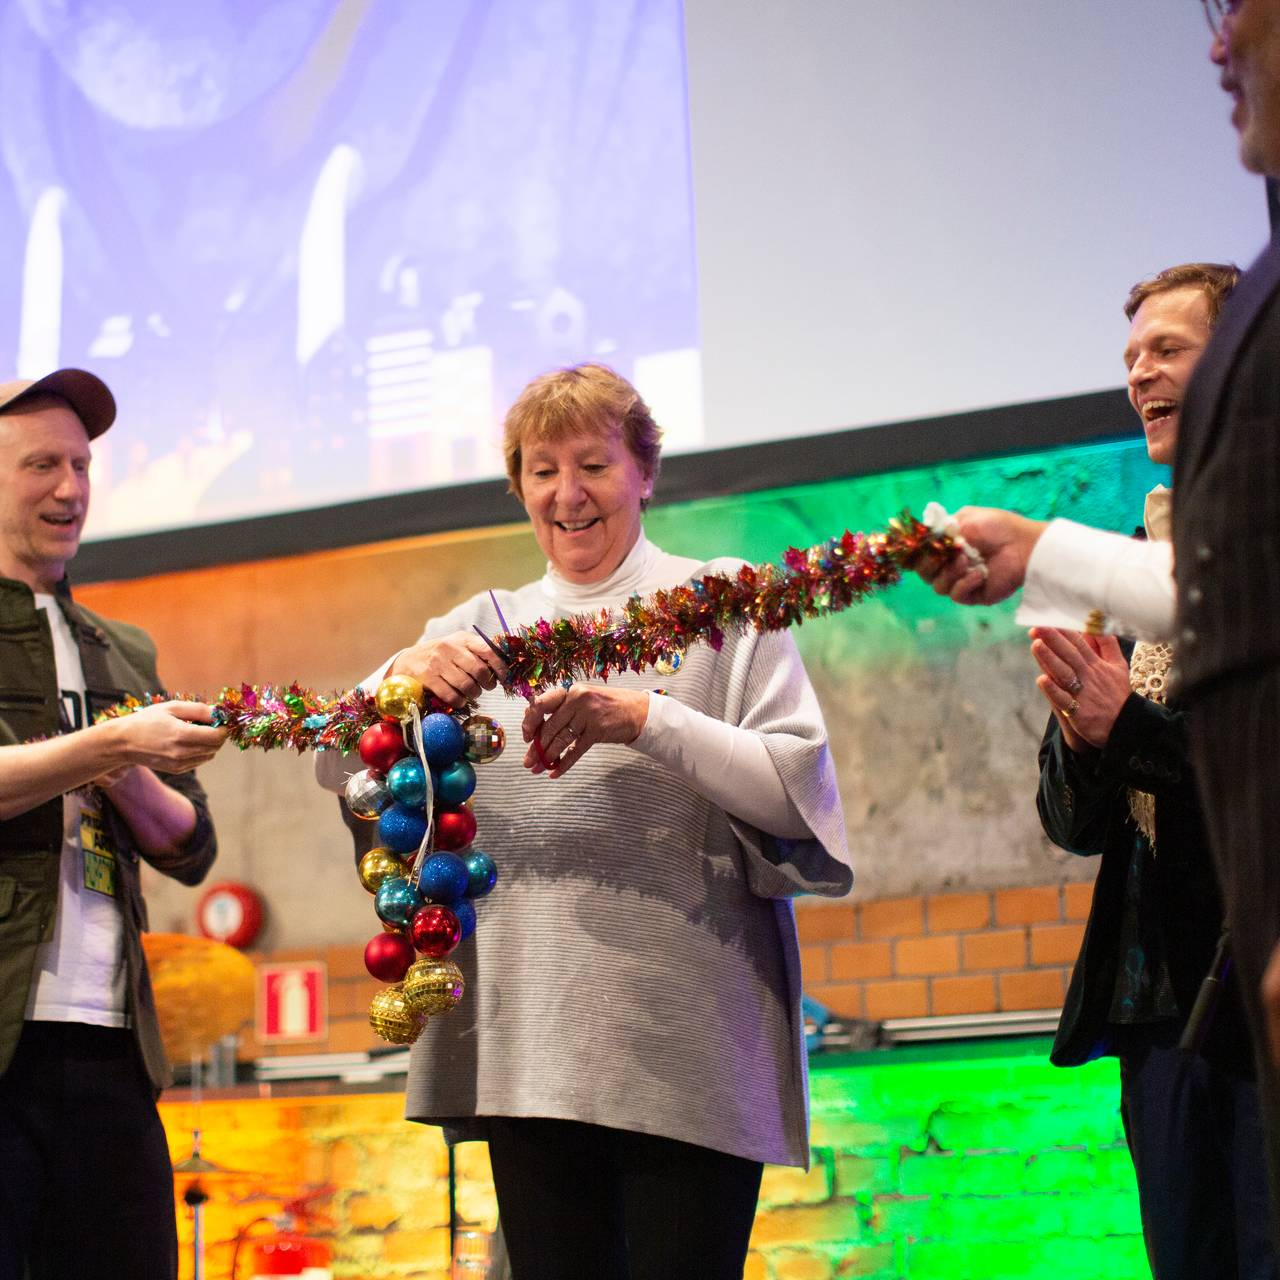 Ordfører i Oslo Marianne Borgen holdt både tale og klippet snor på DOGA fredag kveld.